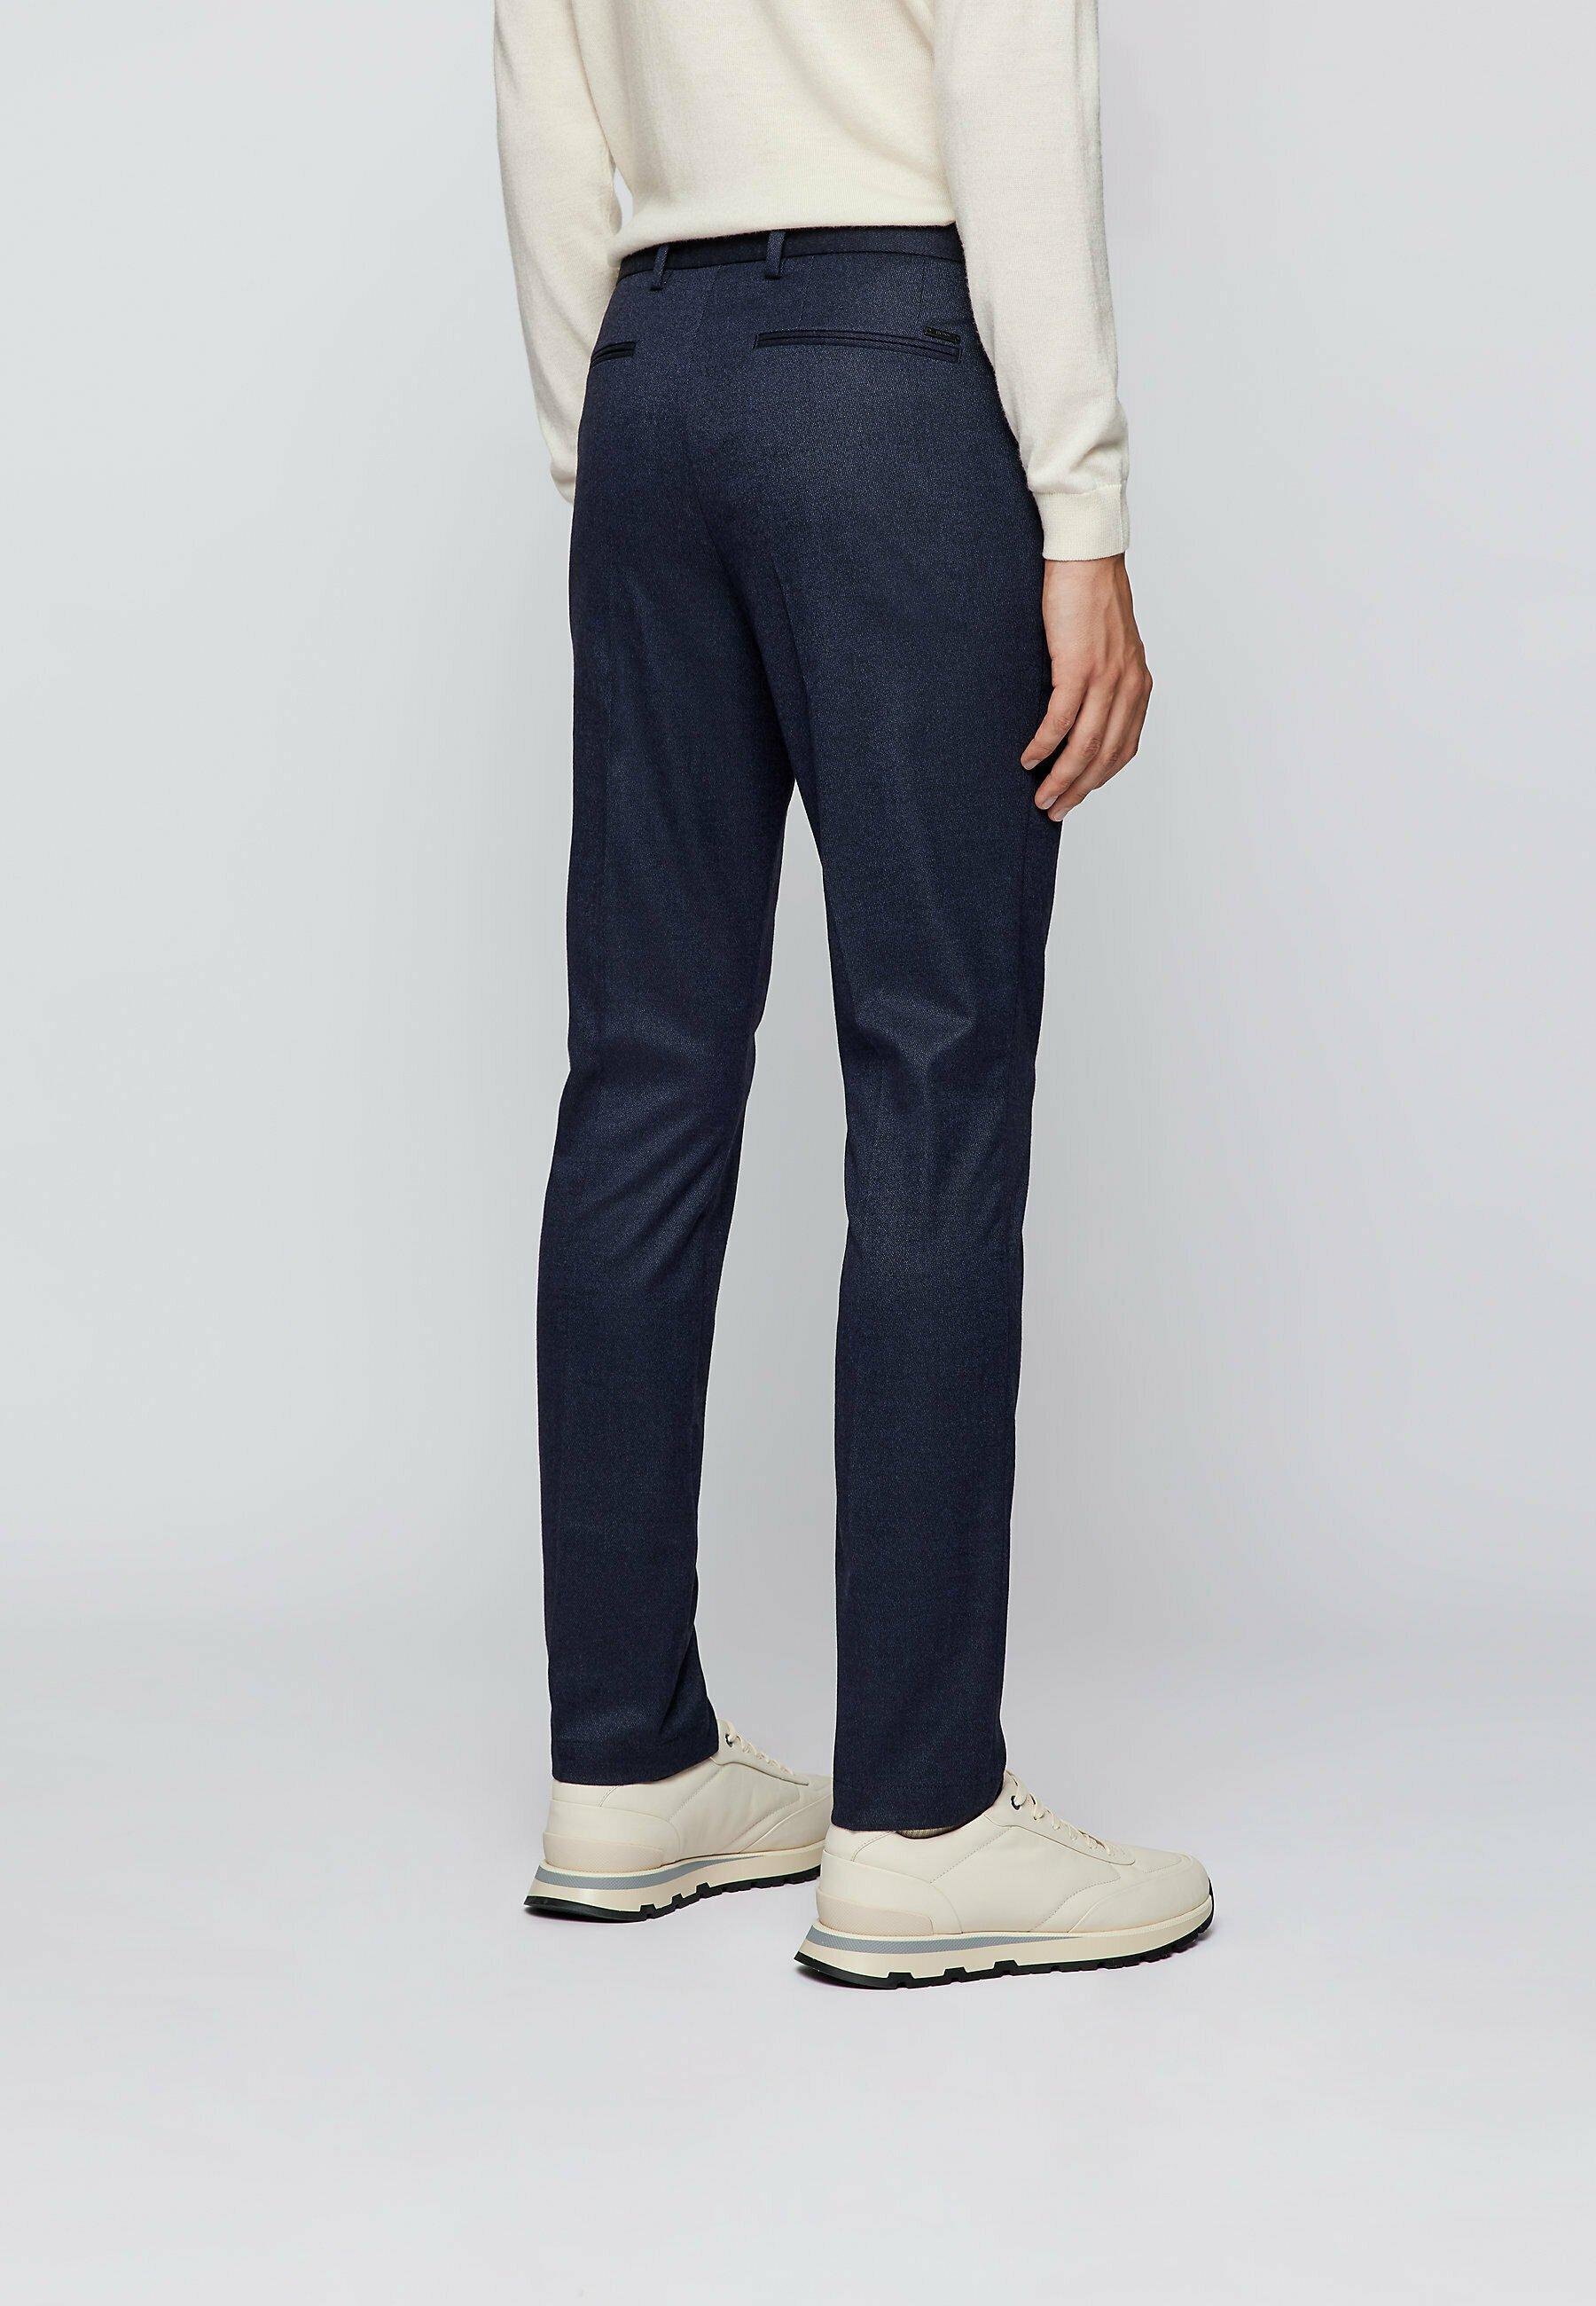 Uomo KAITO - Pantaloni